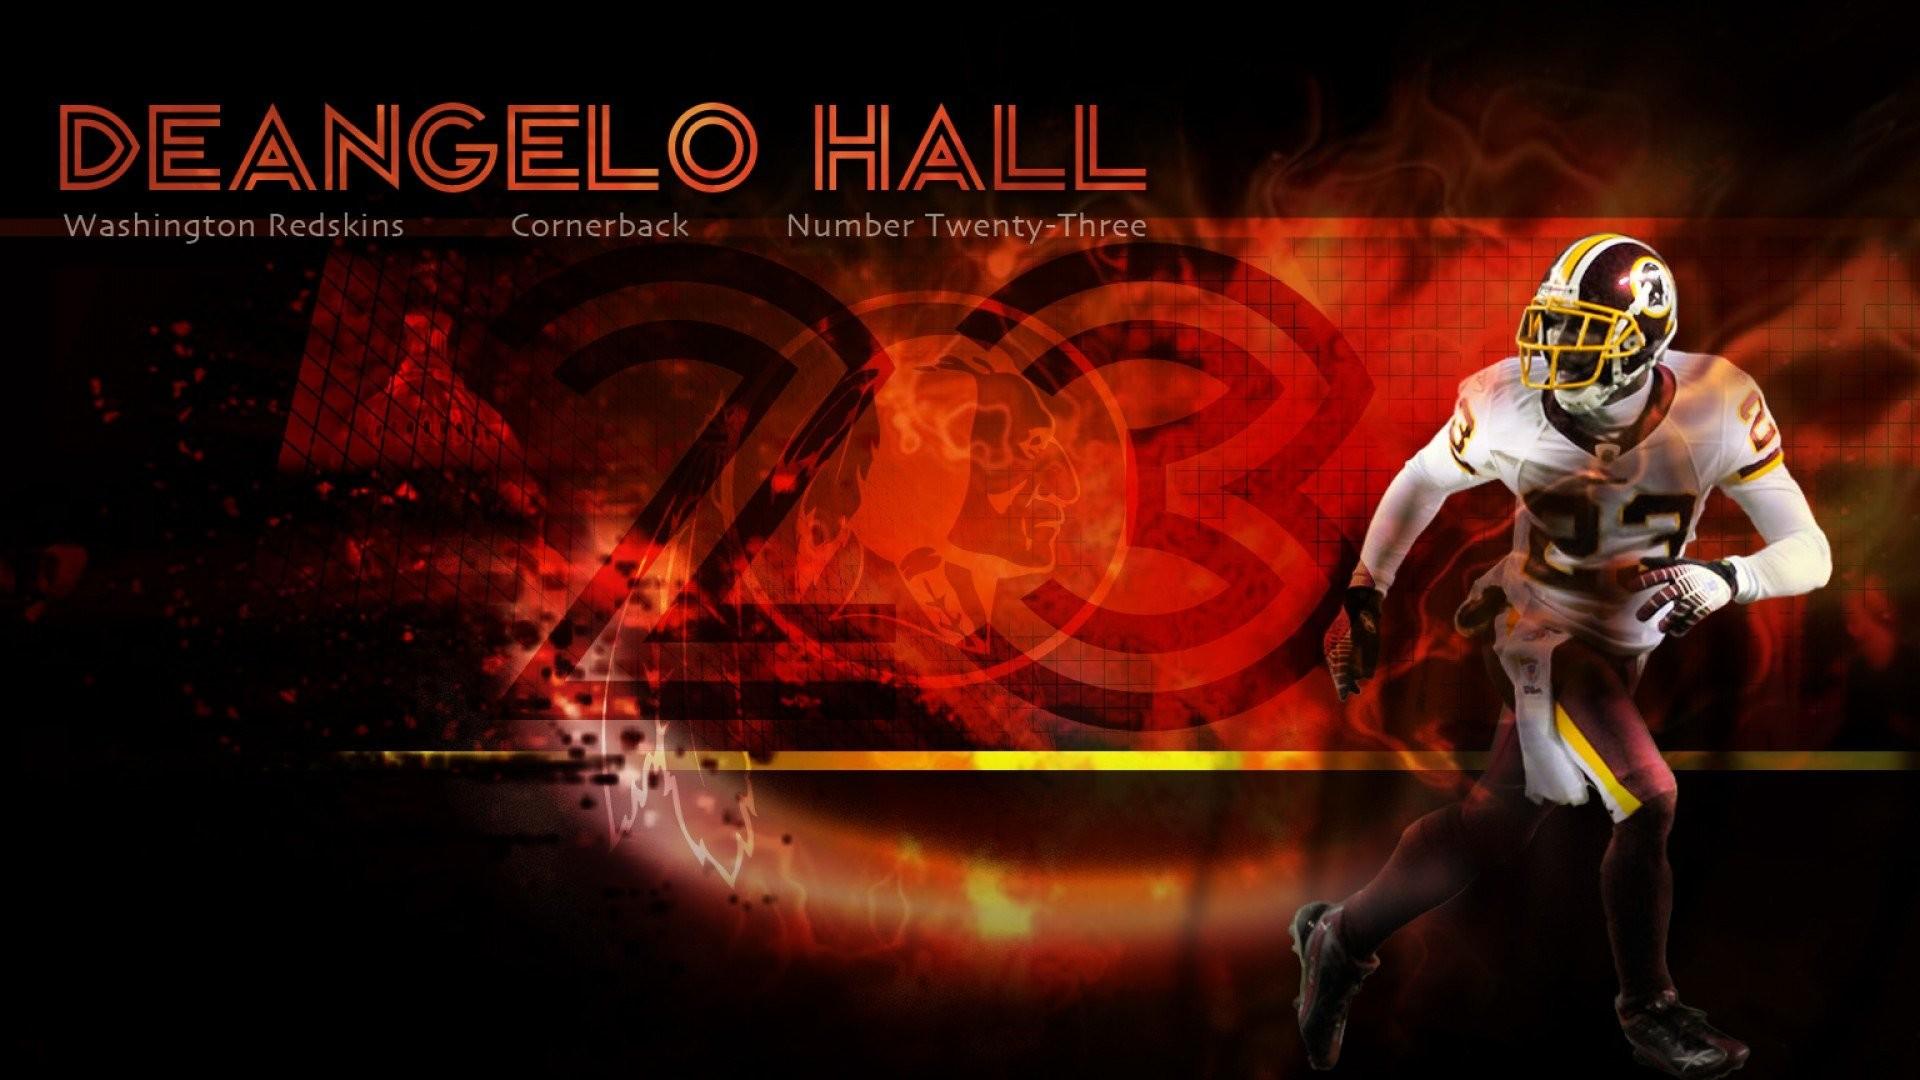 Deangelo Hall Redskins Wallpaper » WallDevil – Best free HD .